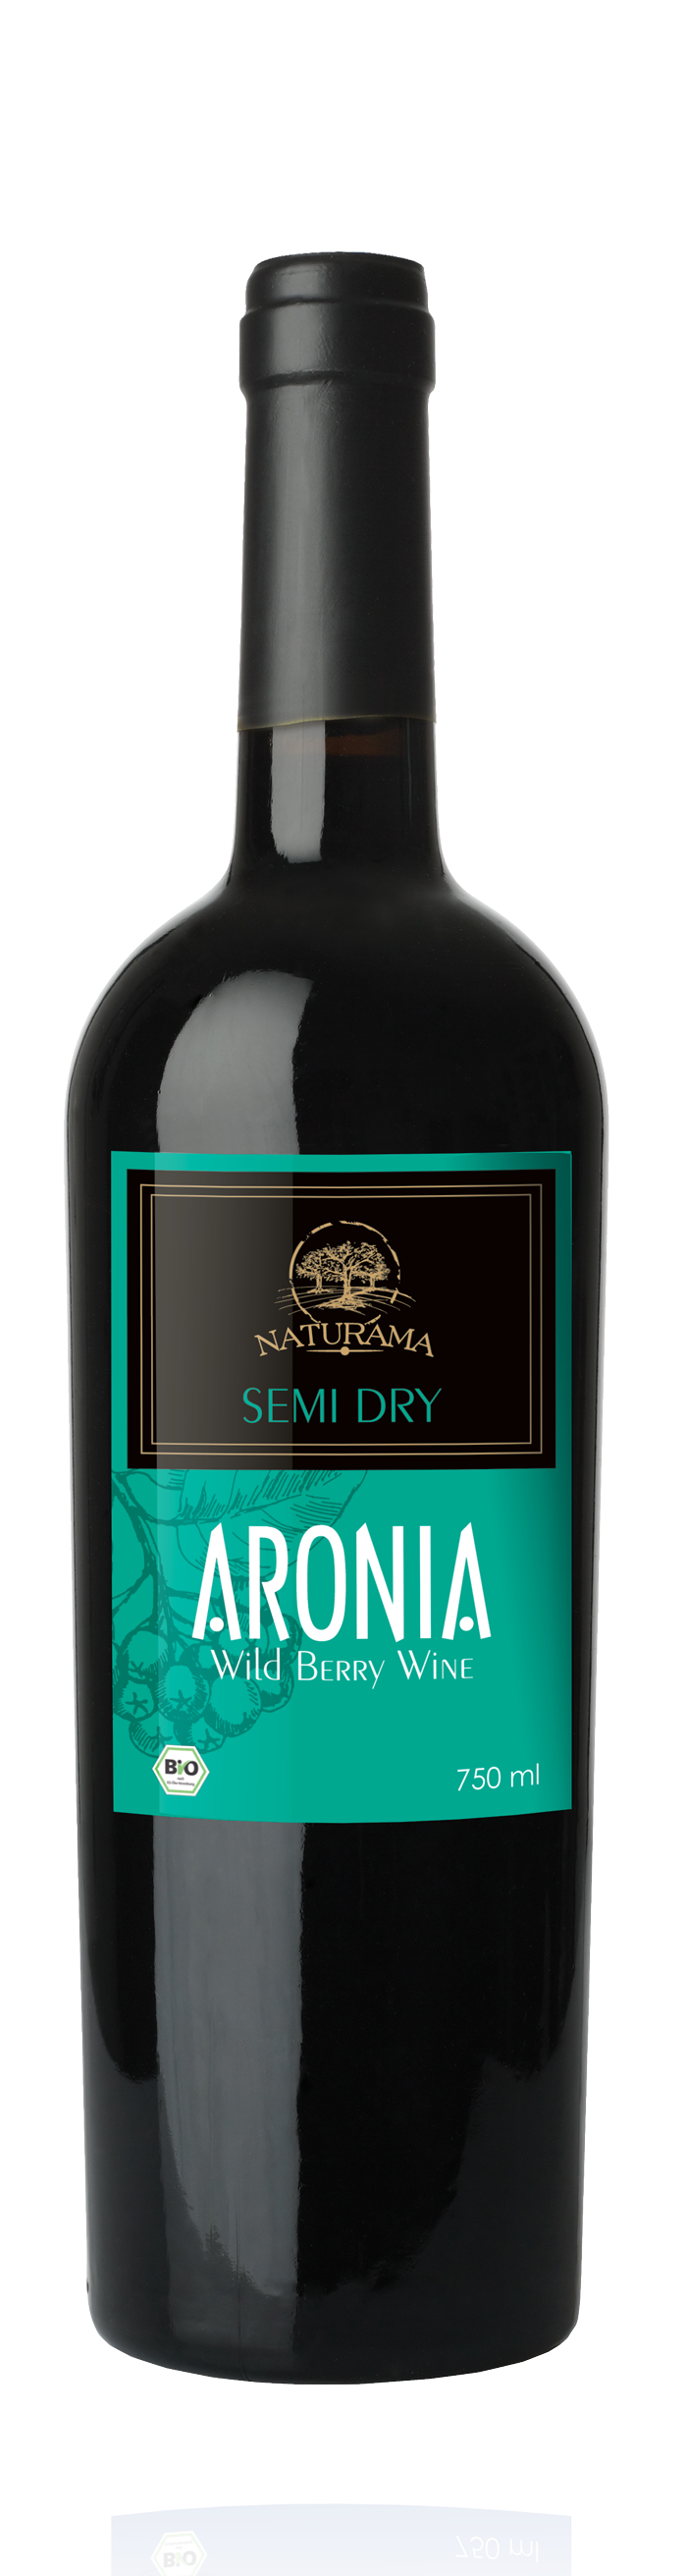 Aronia – Wild Berry Wine (SEMI DRY)